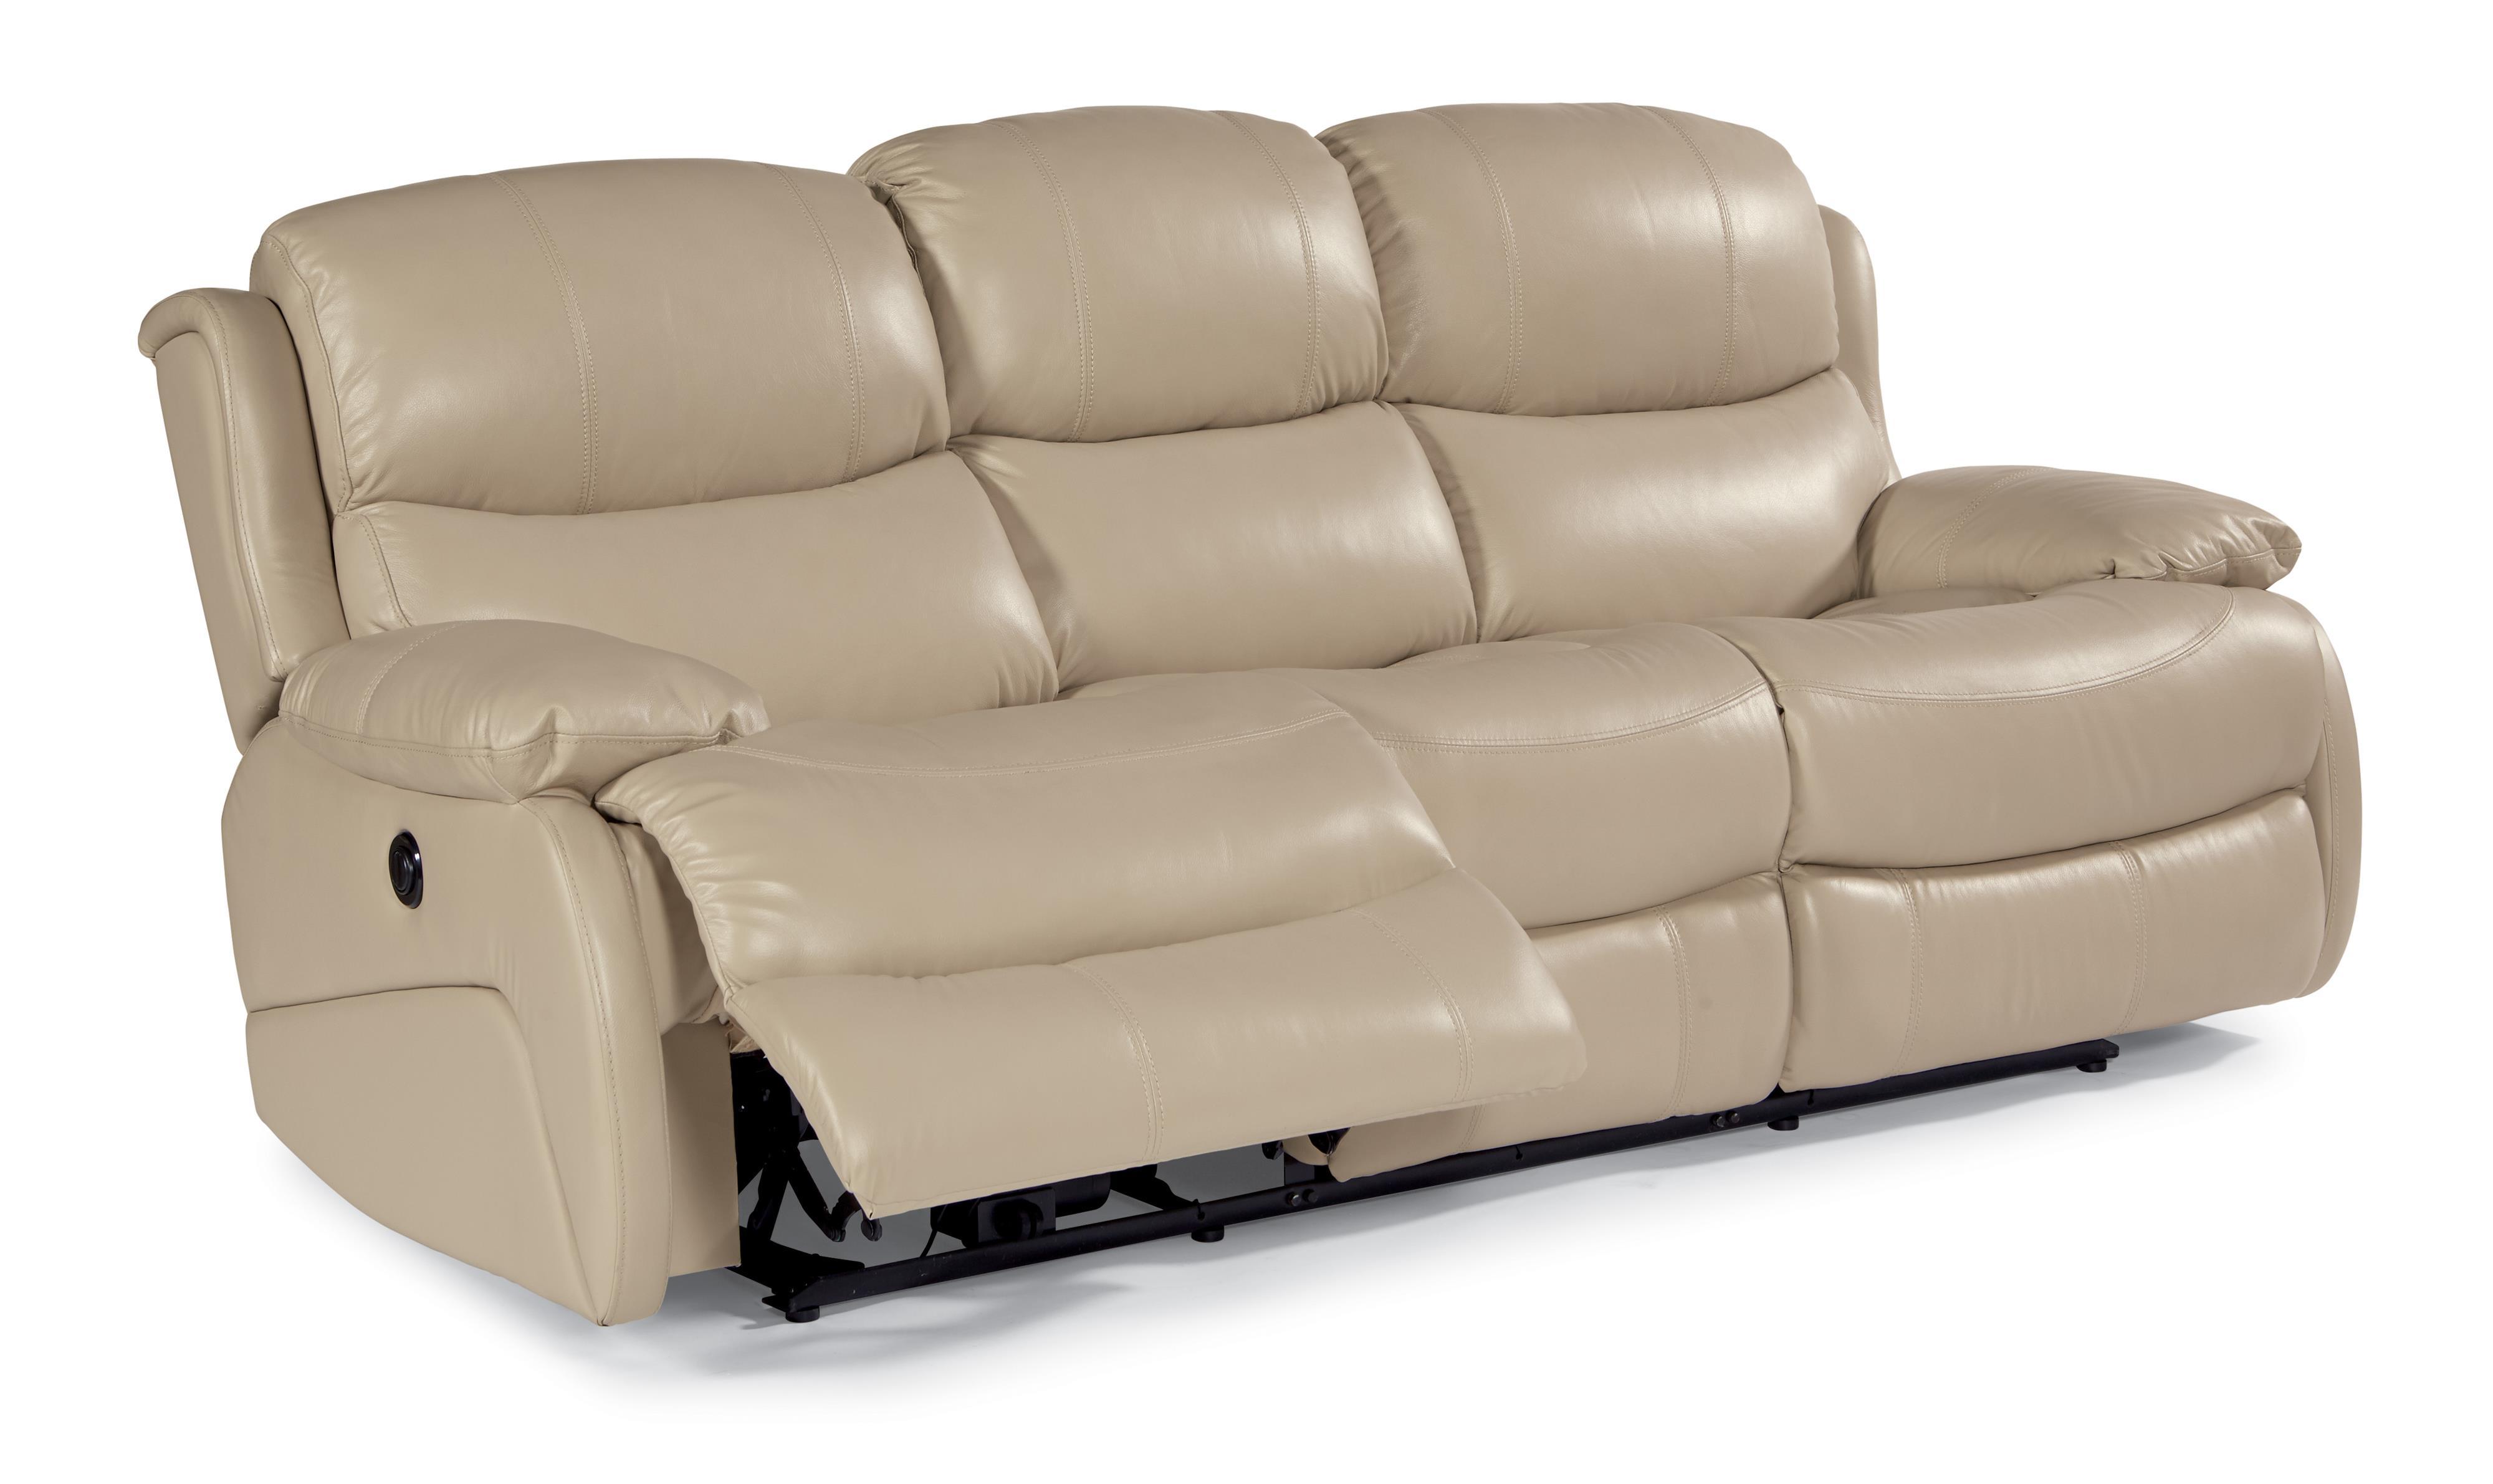 flexsteel capitol double reclining sofa buchanan top grain leather motion latitudes amsterdam 1677 62p power